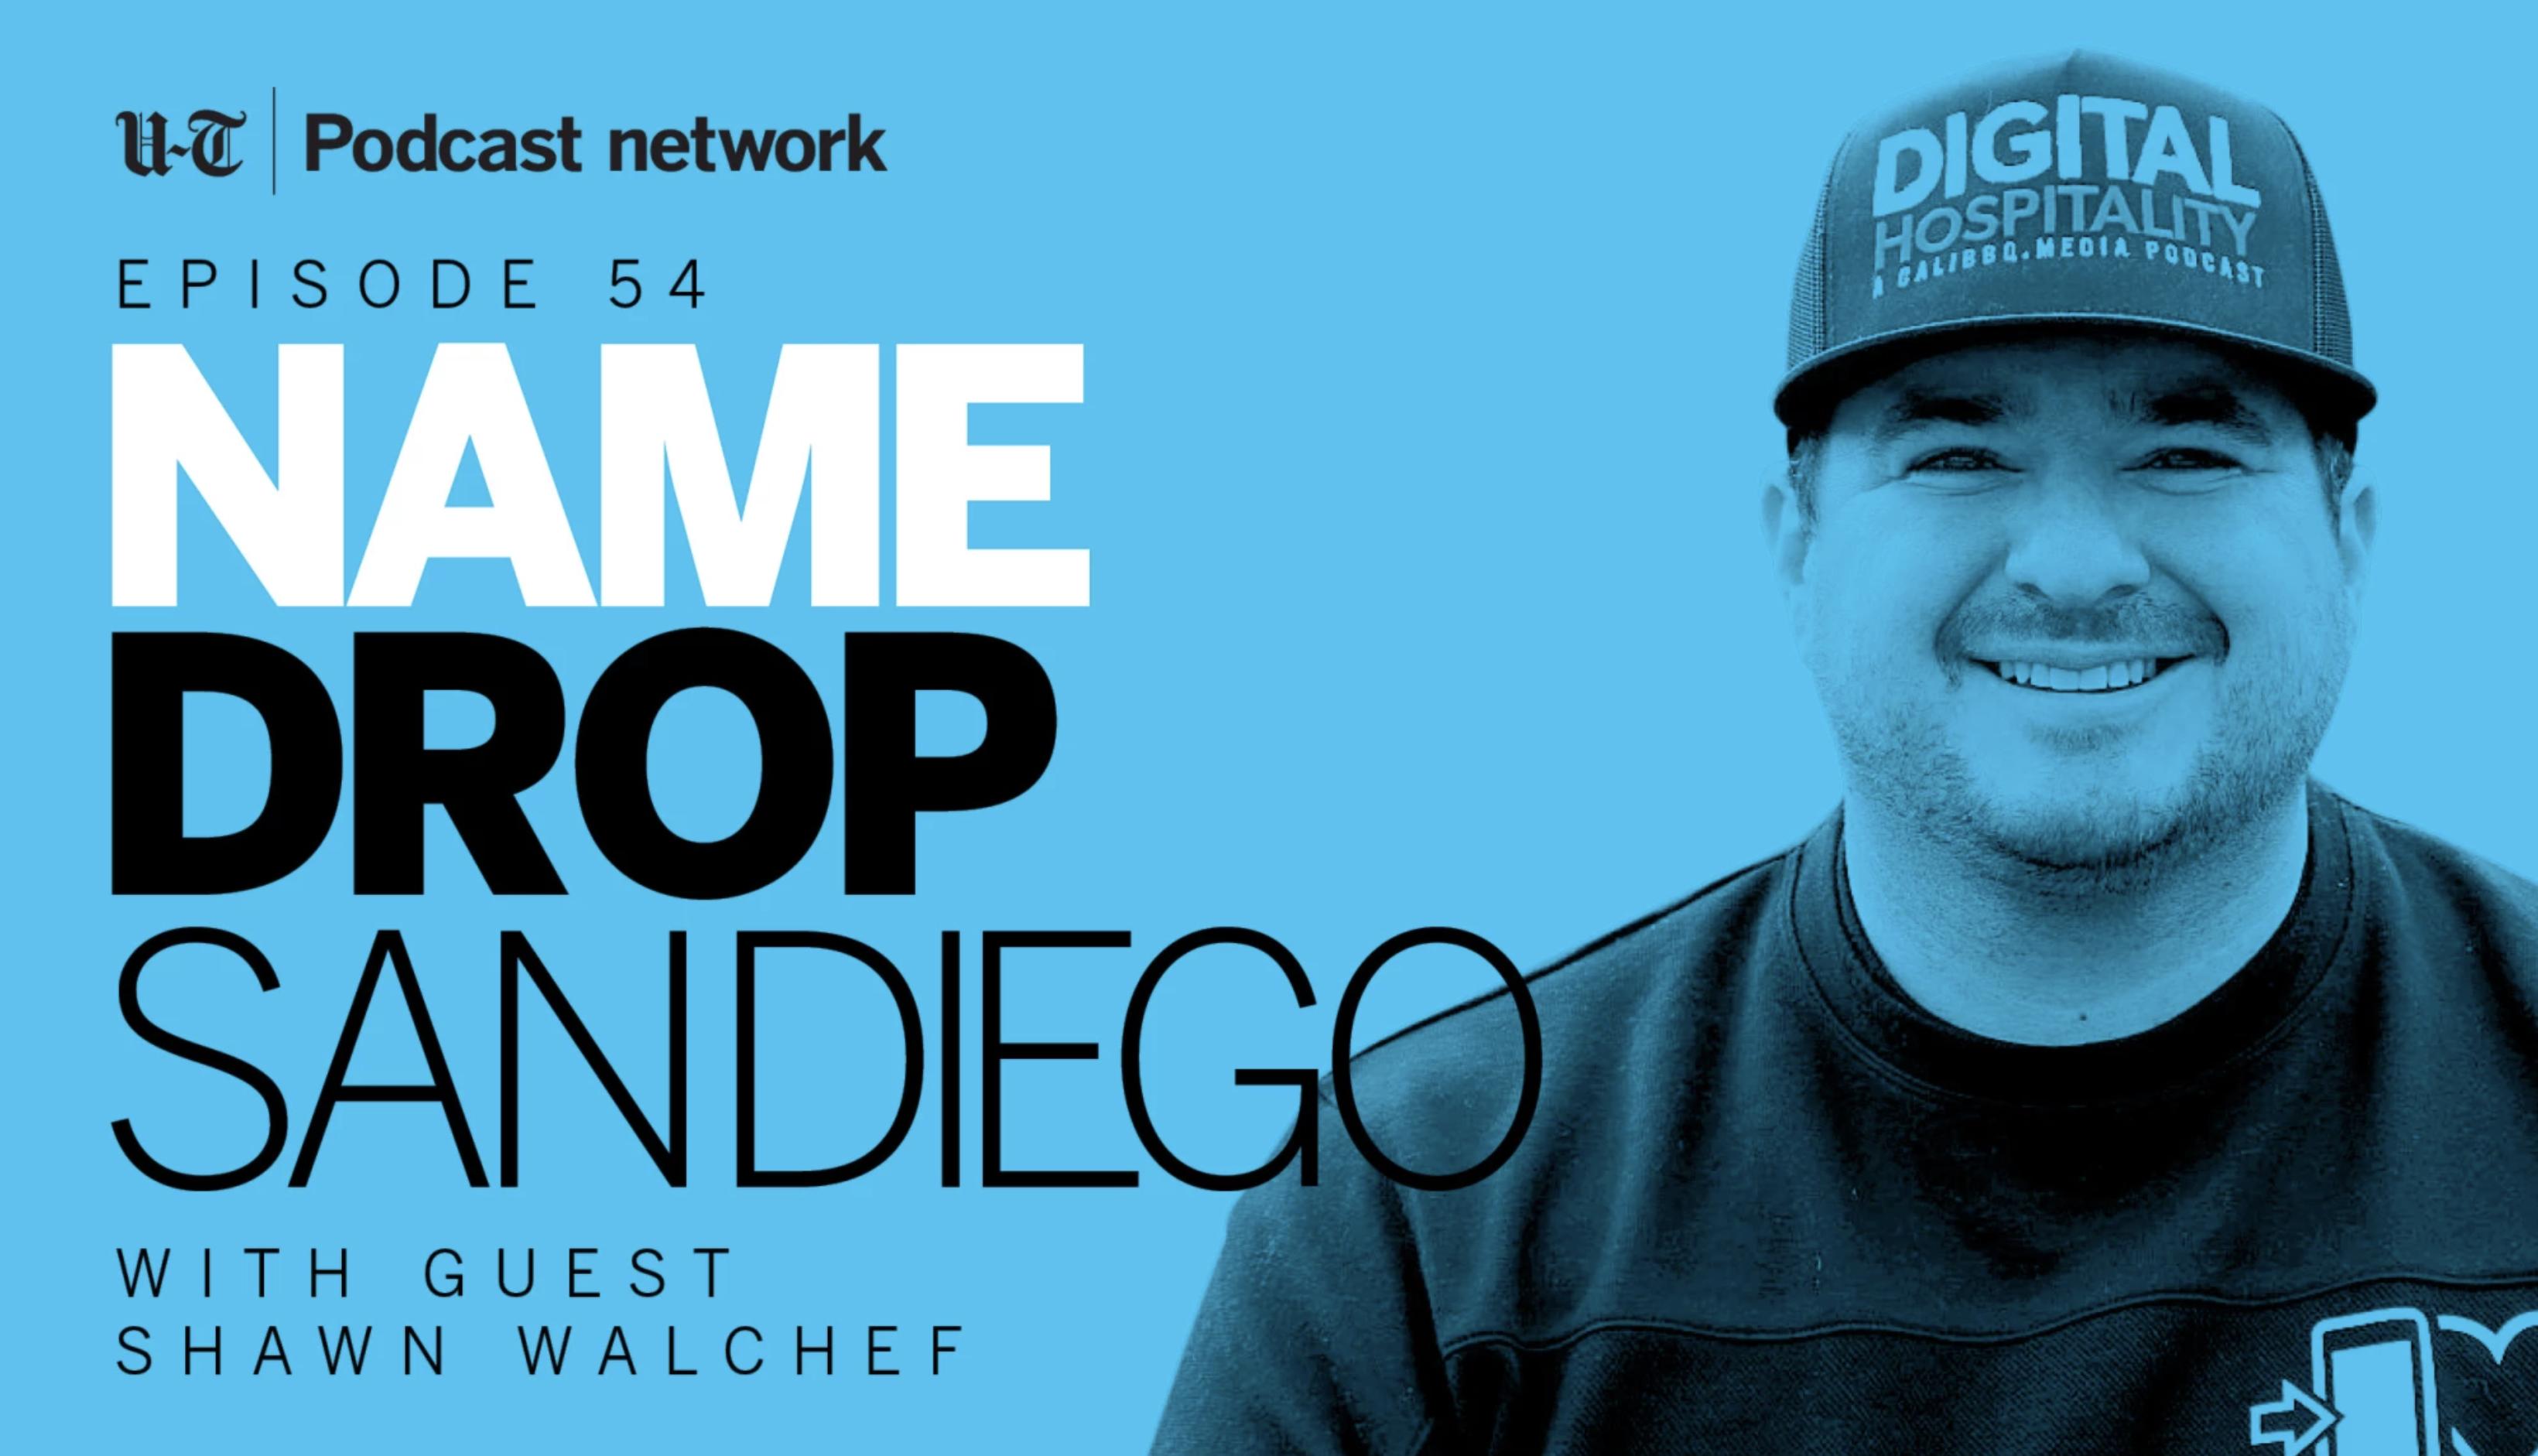 Namedrop san diego interviews shawn walchef